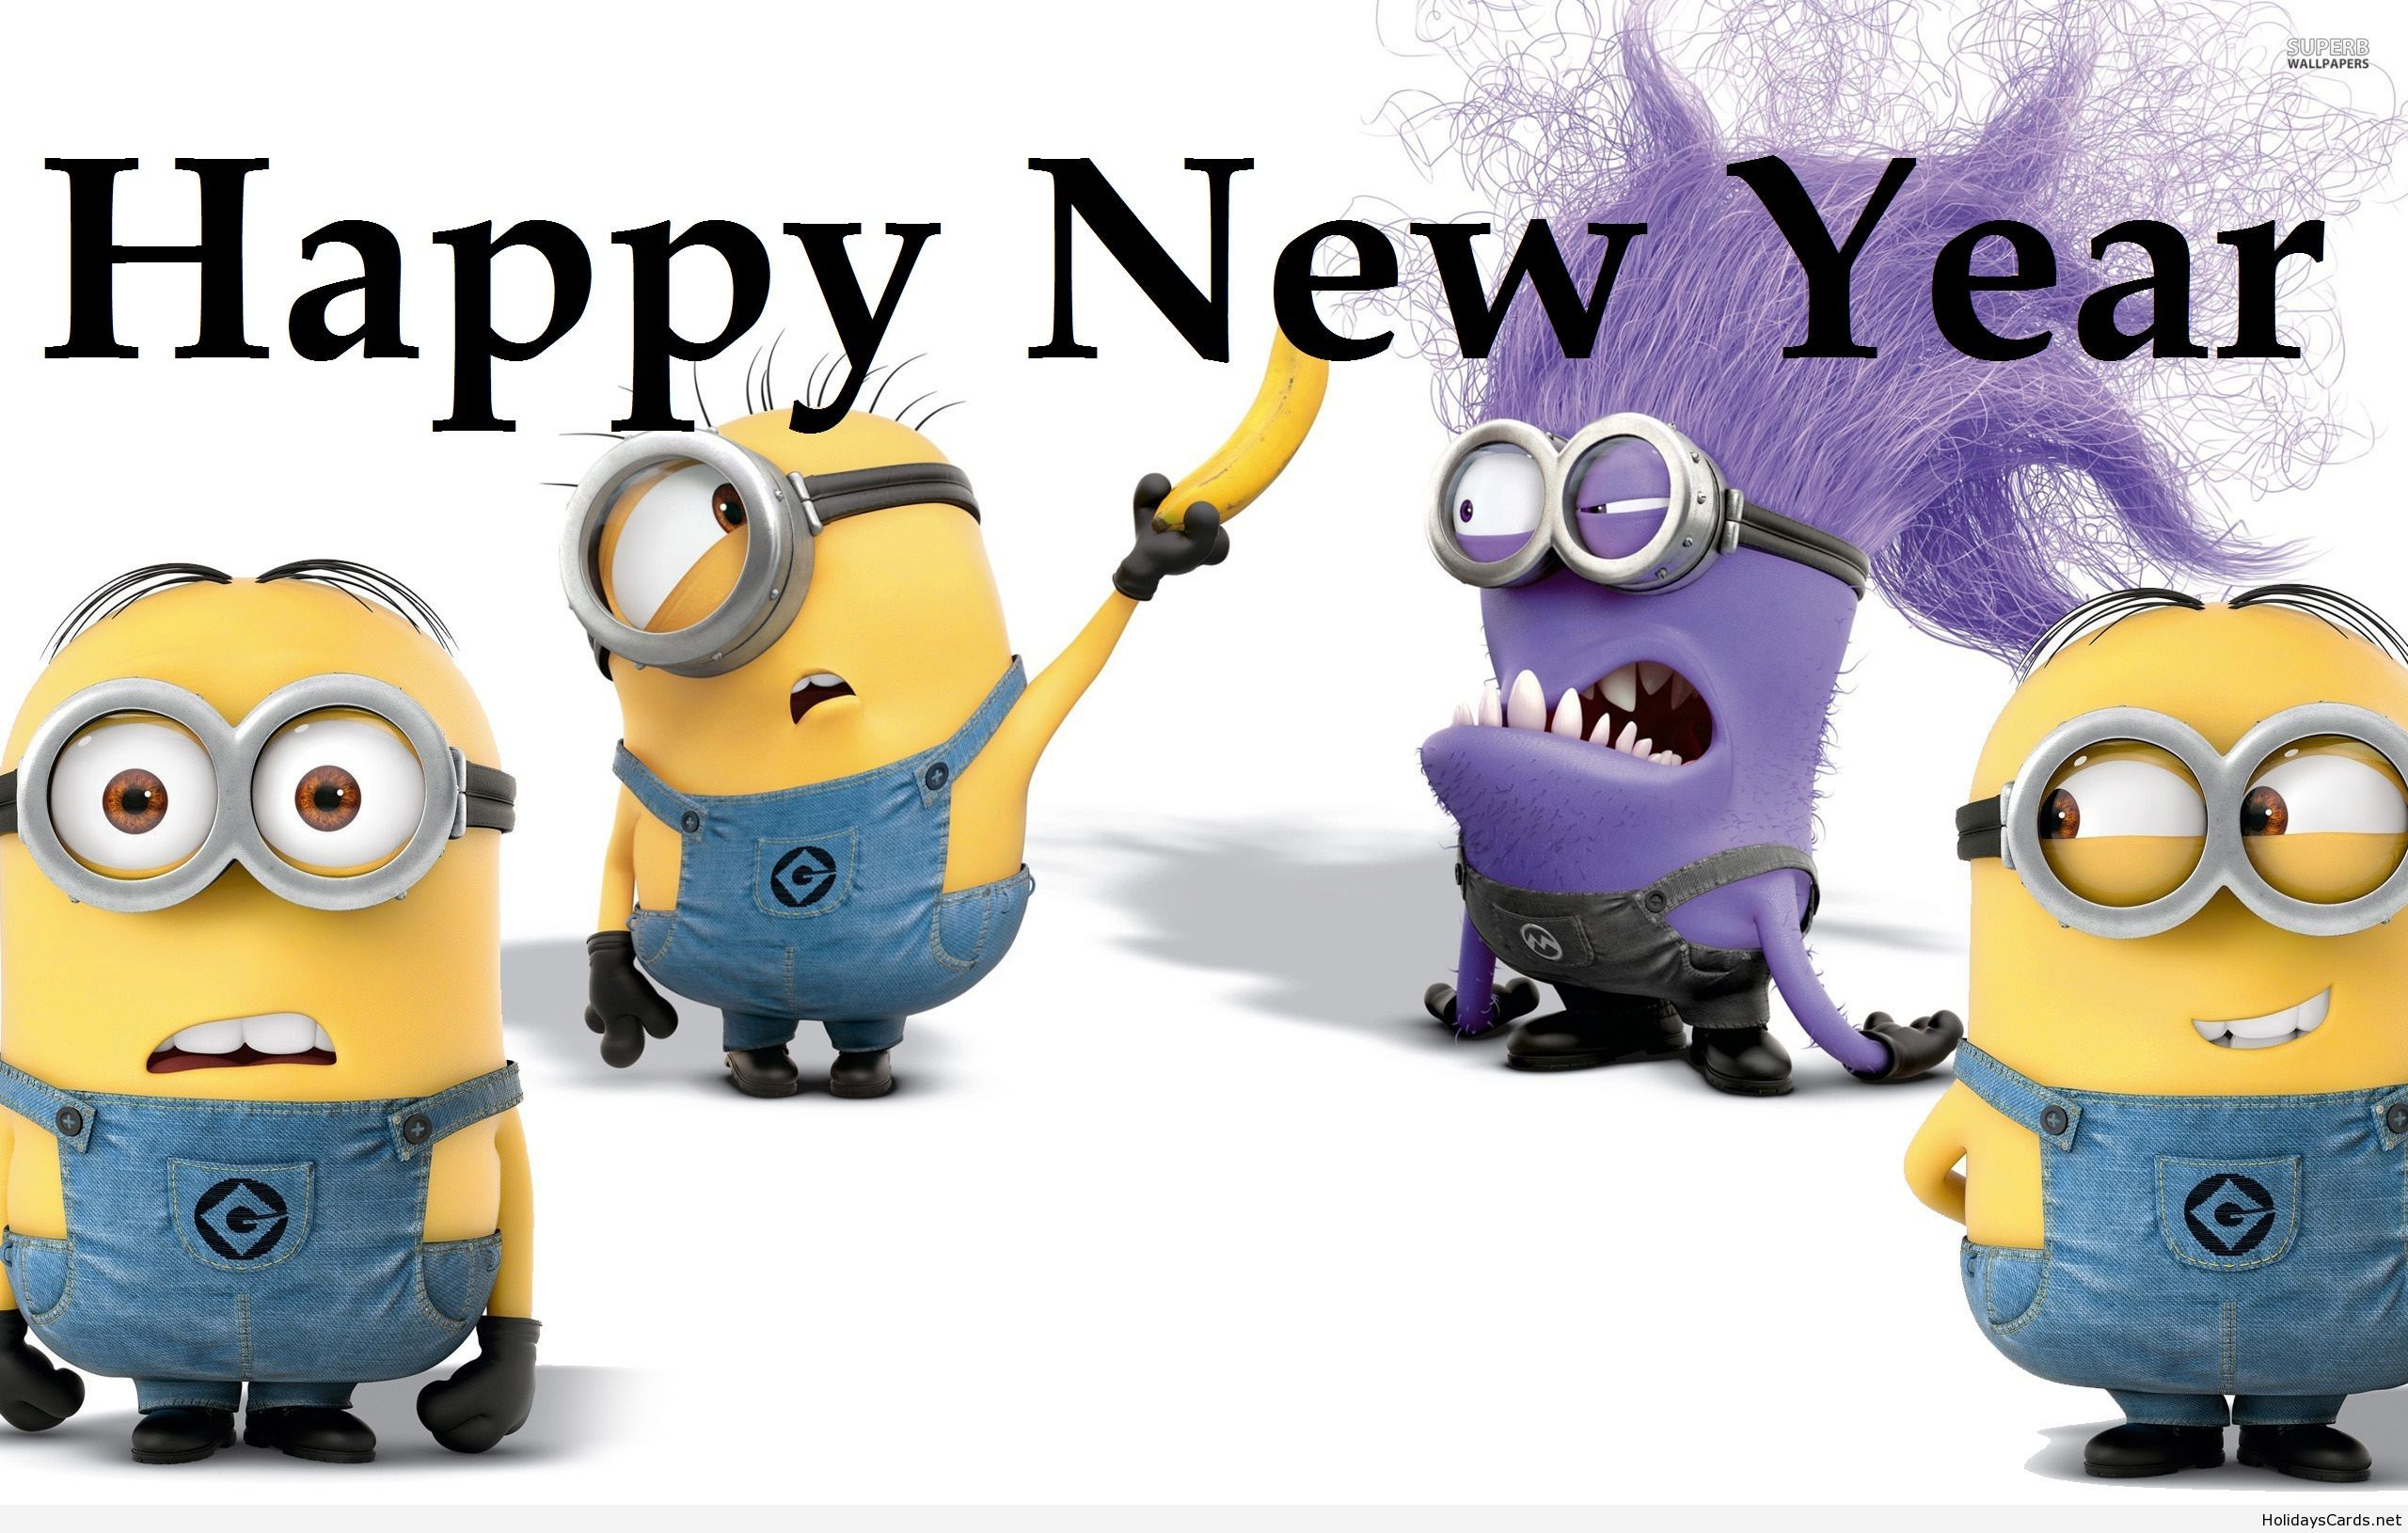 new year minions happy new year pinterest minion jpg 2560x1630 happy new year 2015 minion